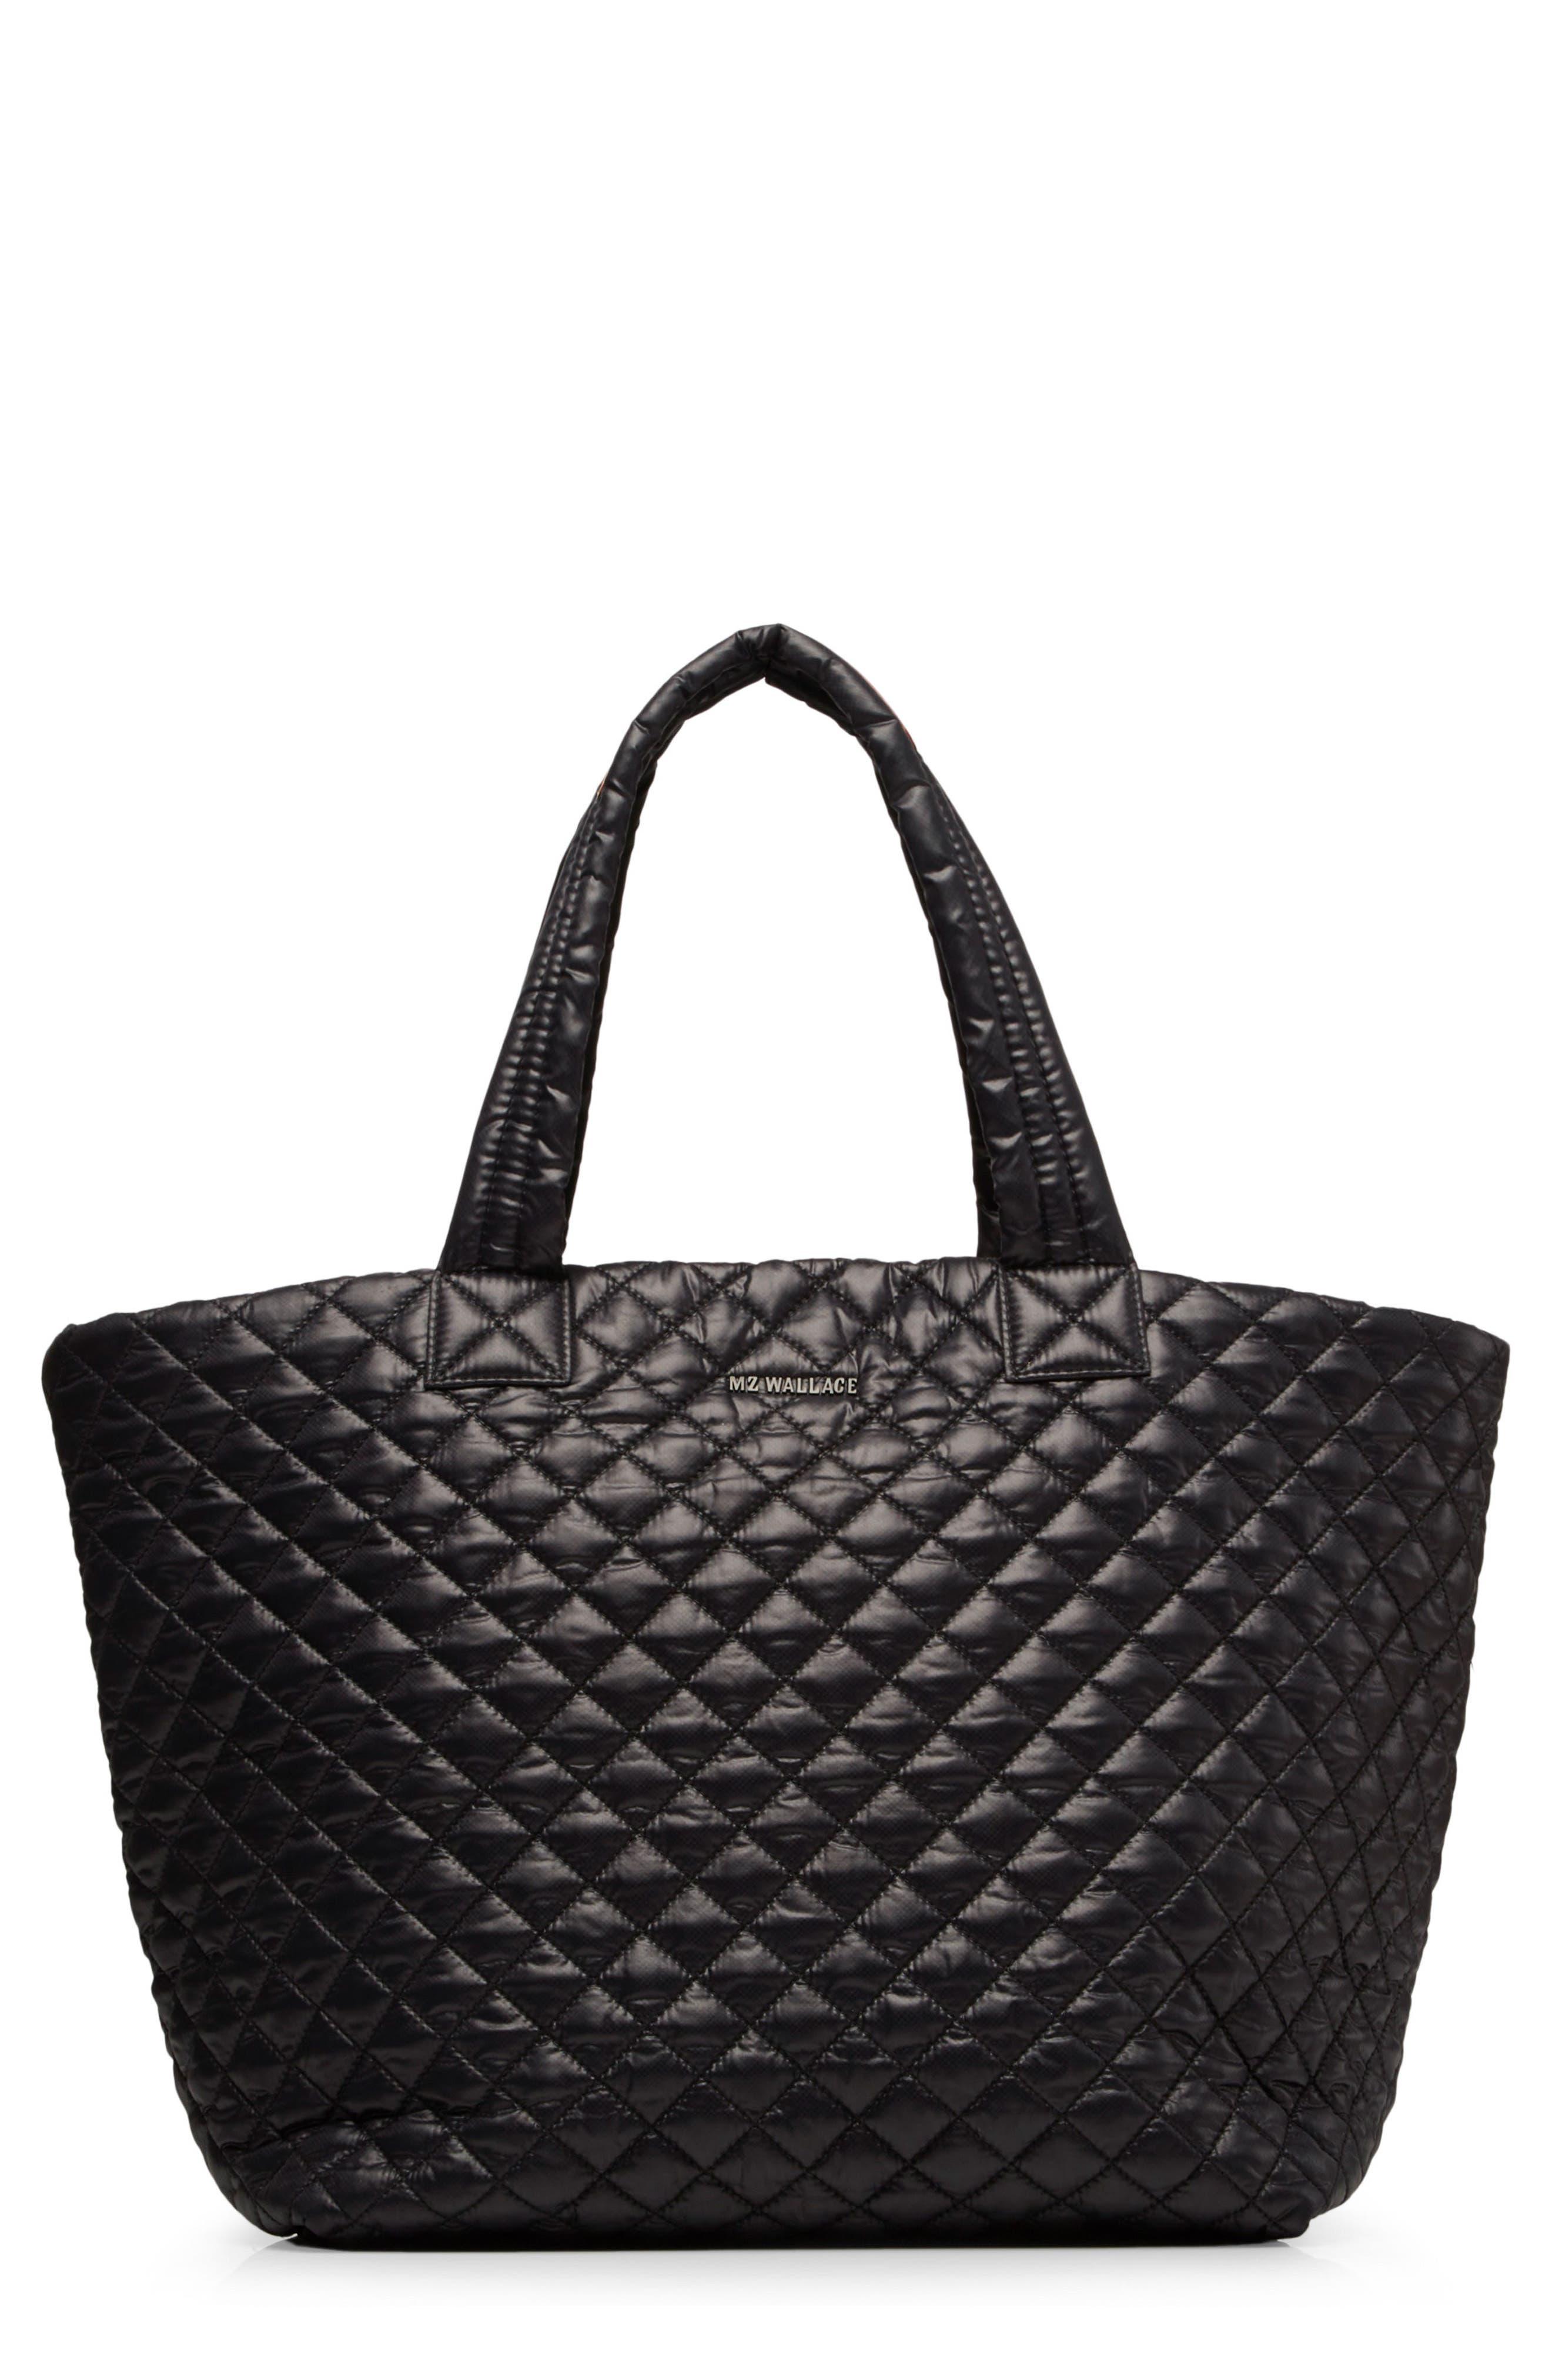 mz wallace handbags. MZ Wallace Large Metro Tote Mz Handbags